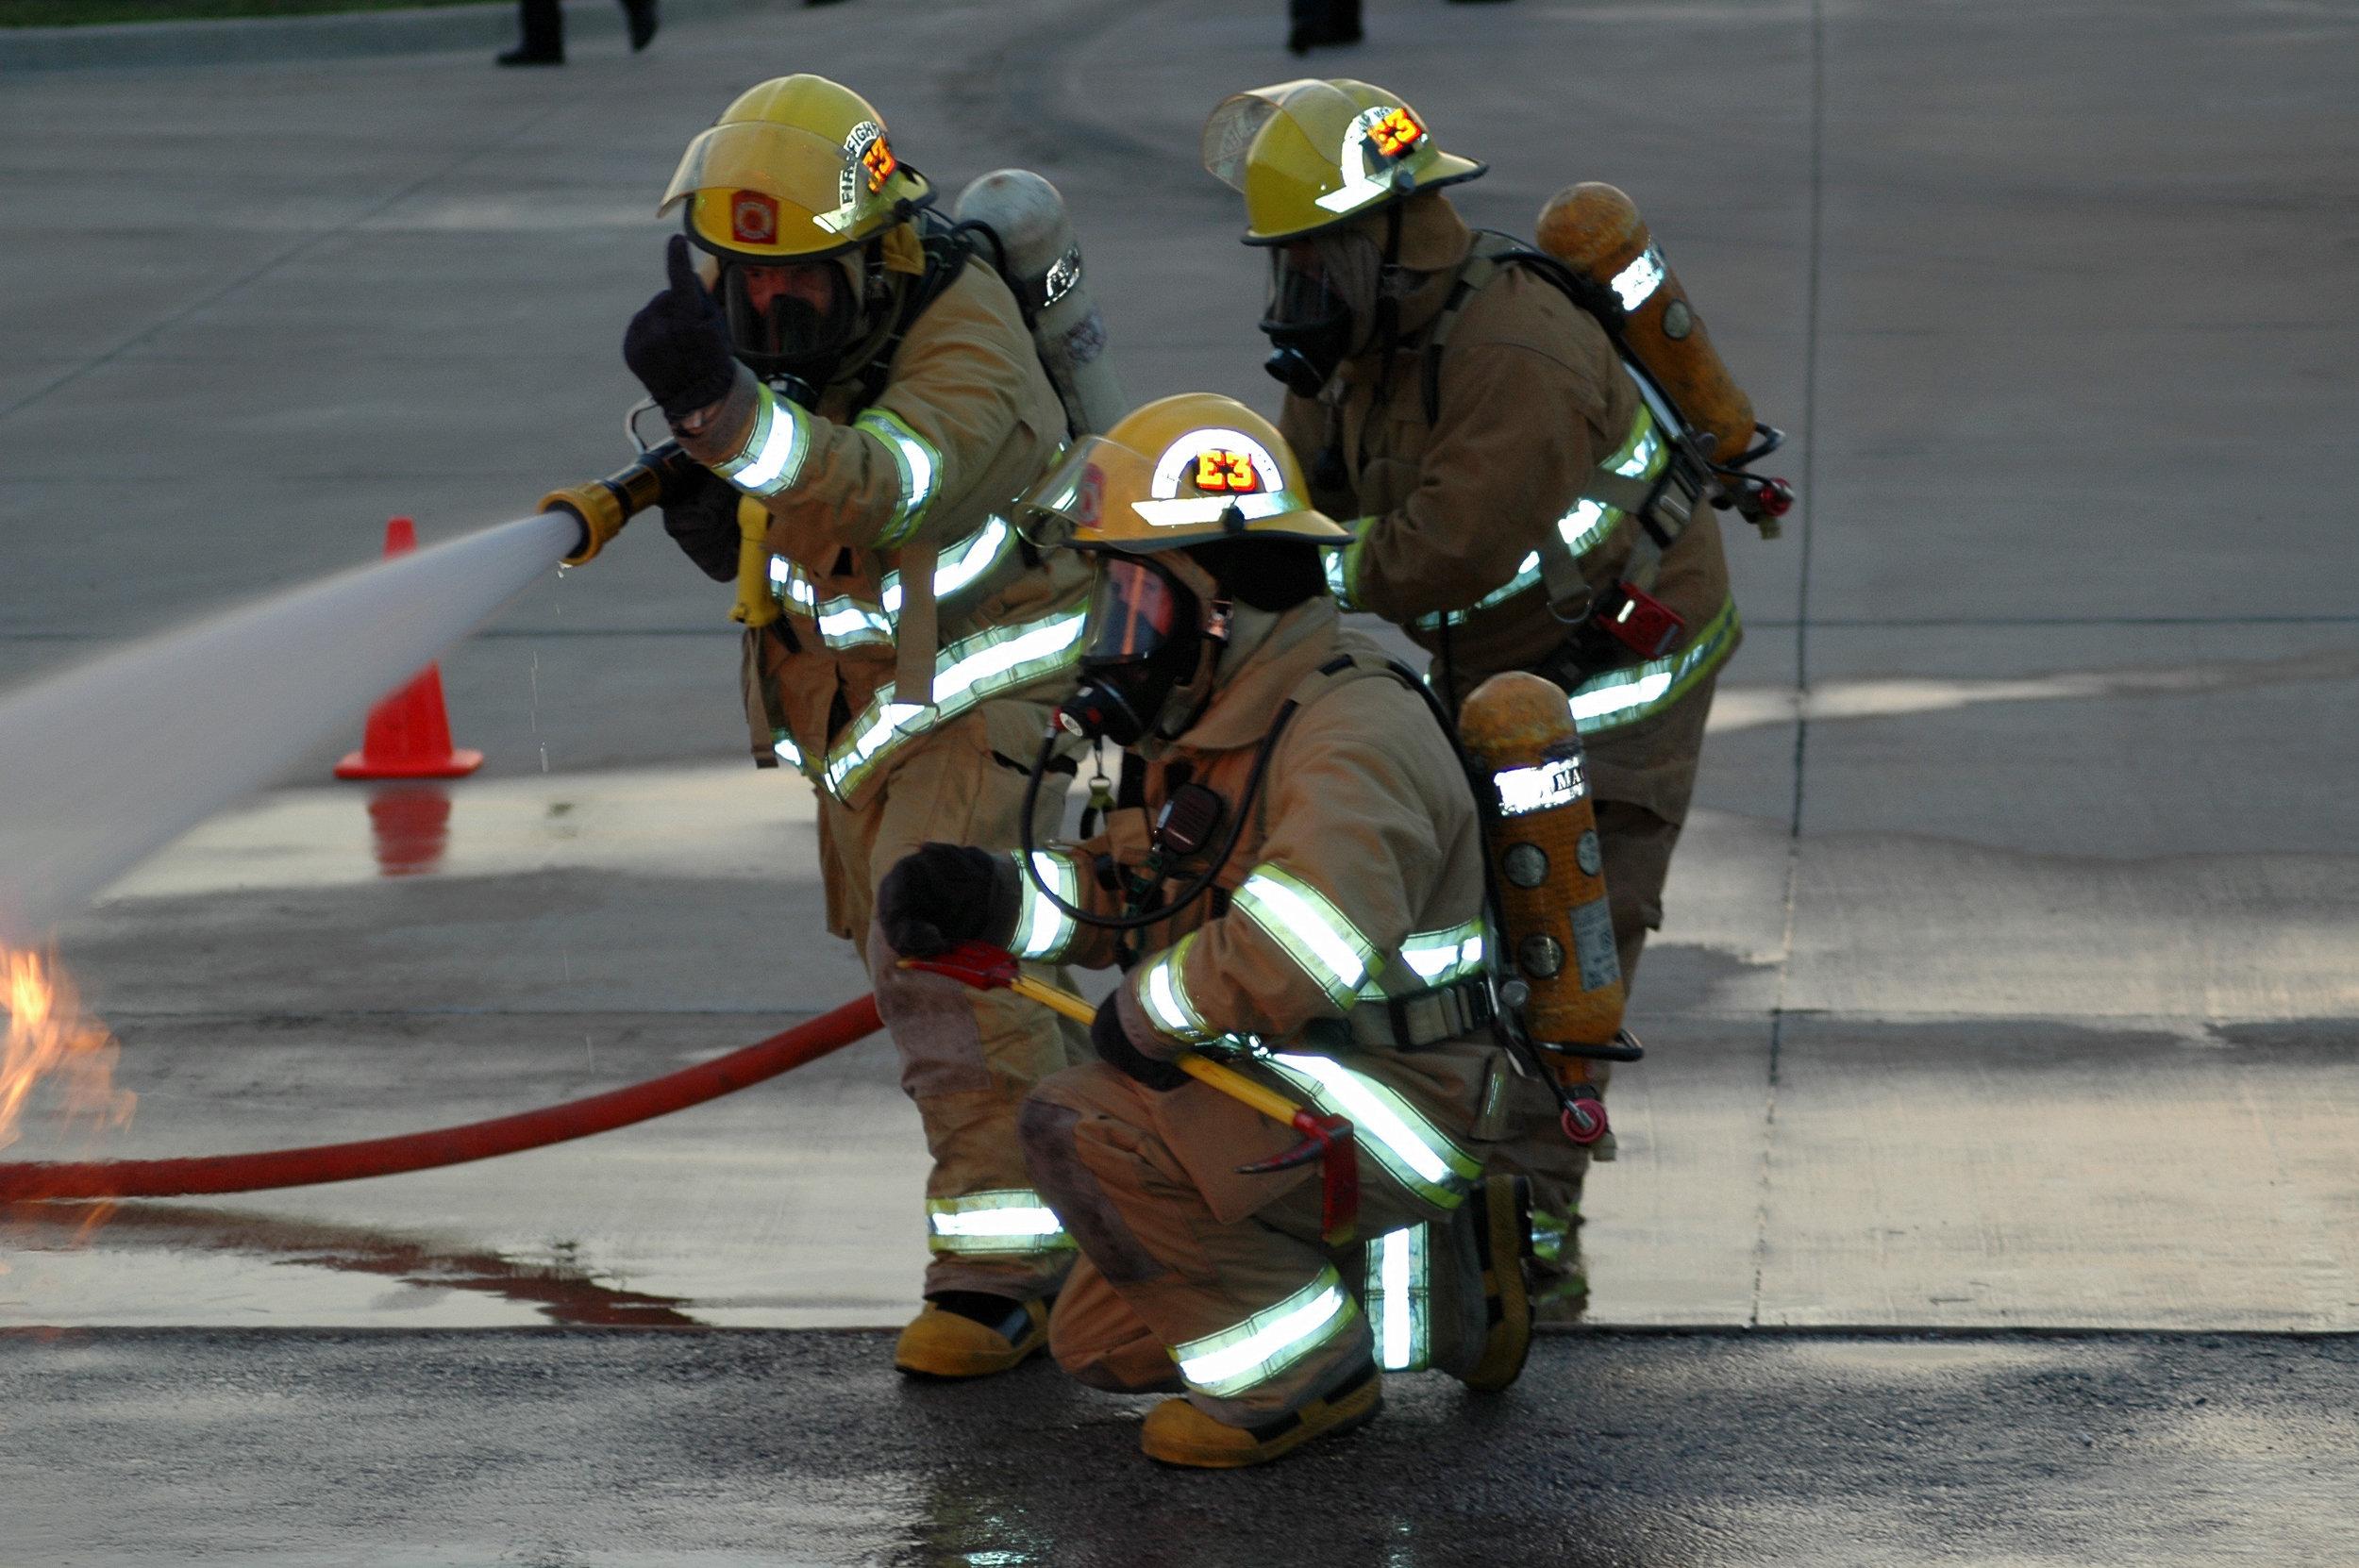 David Leonard crouched preparing to enter a Live Burn Training.